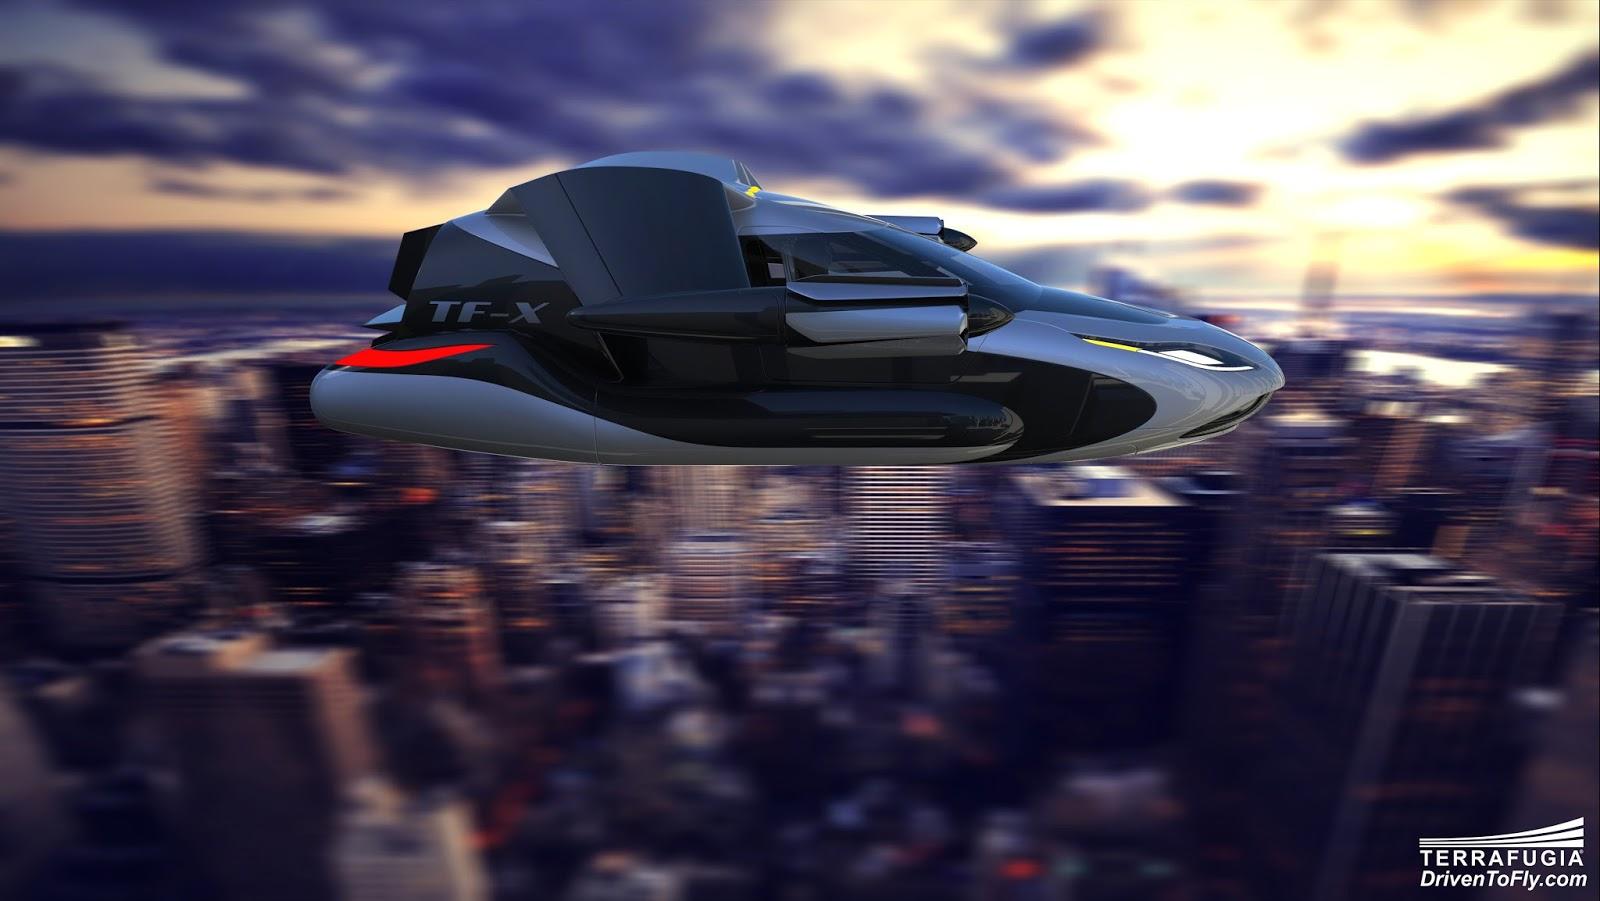 terrafugia tf Είναι το μέλλον της αστικής μετακίνησης στον αέρα; Terrafugia, Terrafugia TF-X ™, Terrafugia Transition, videos